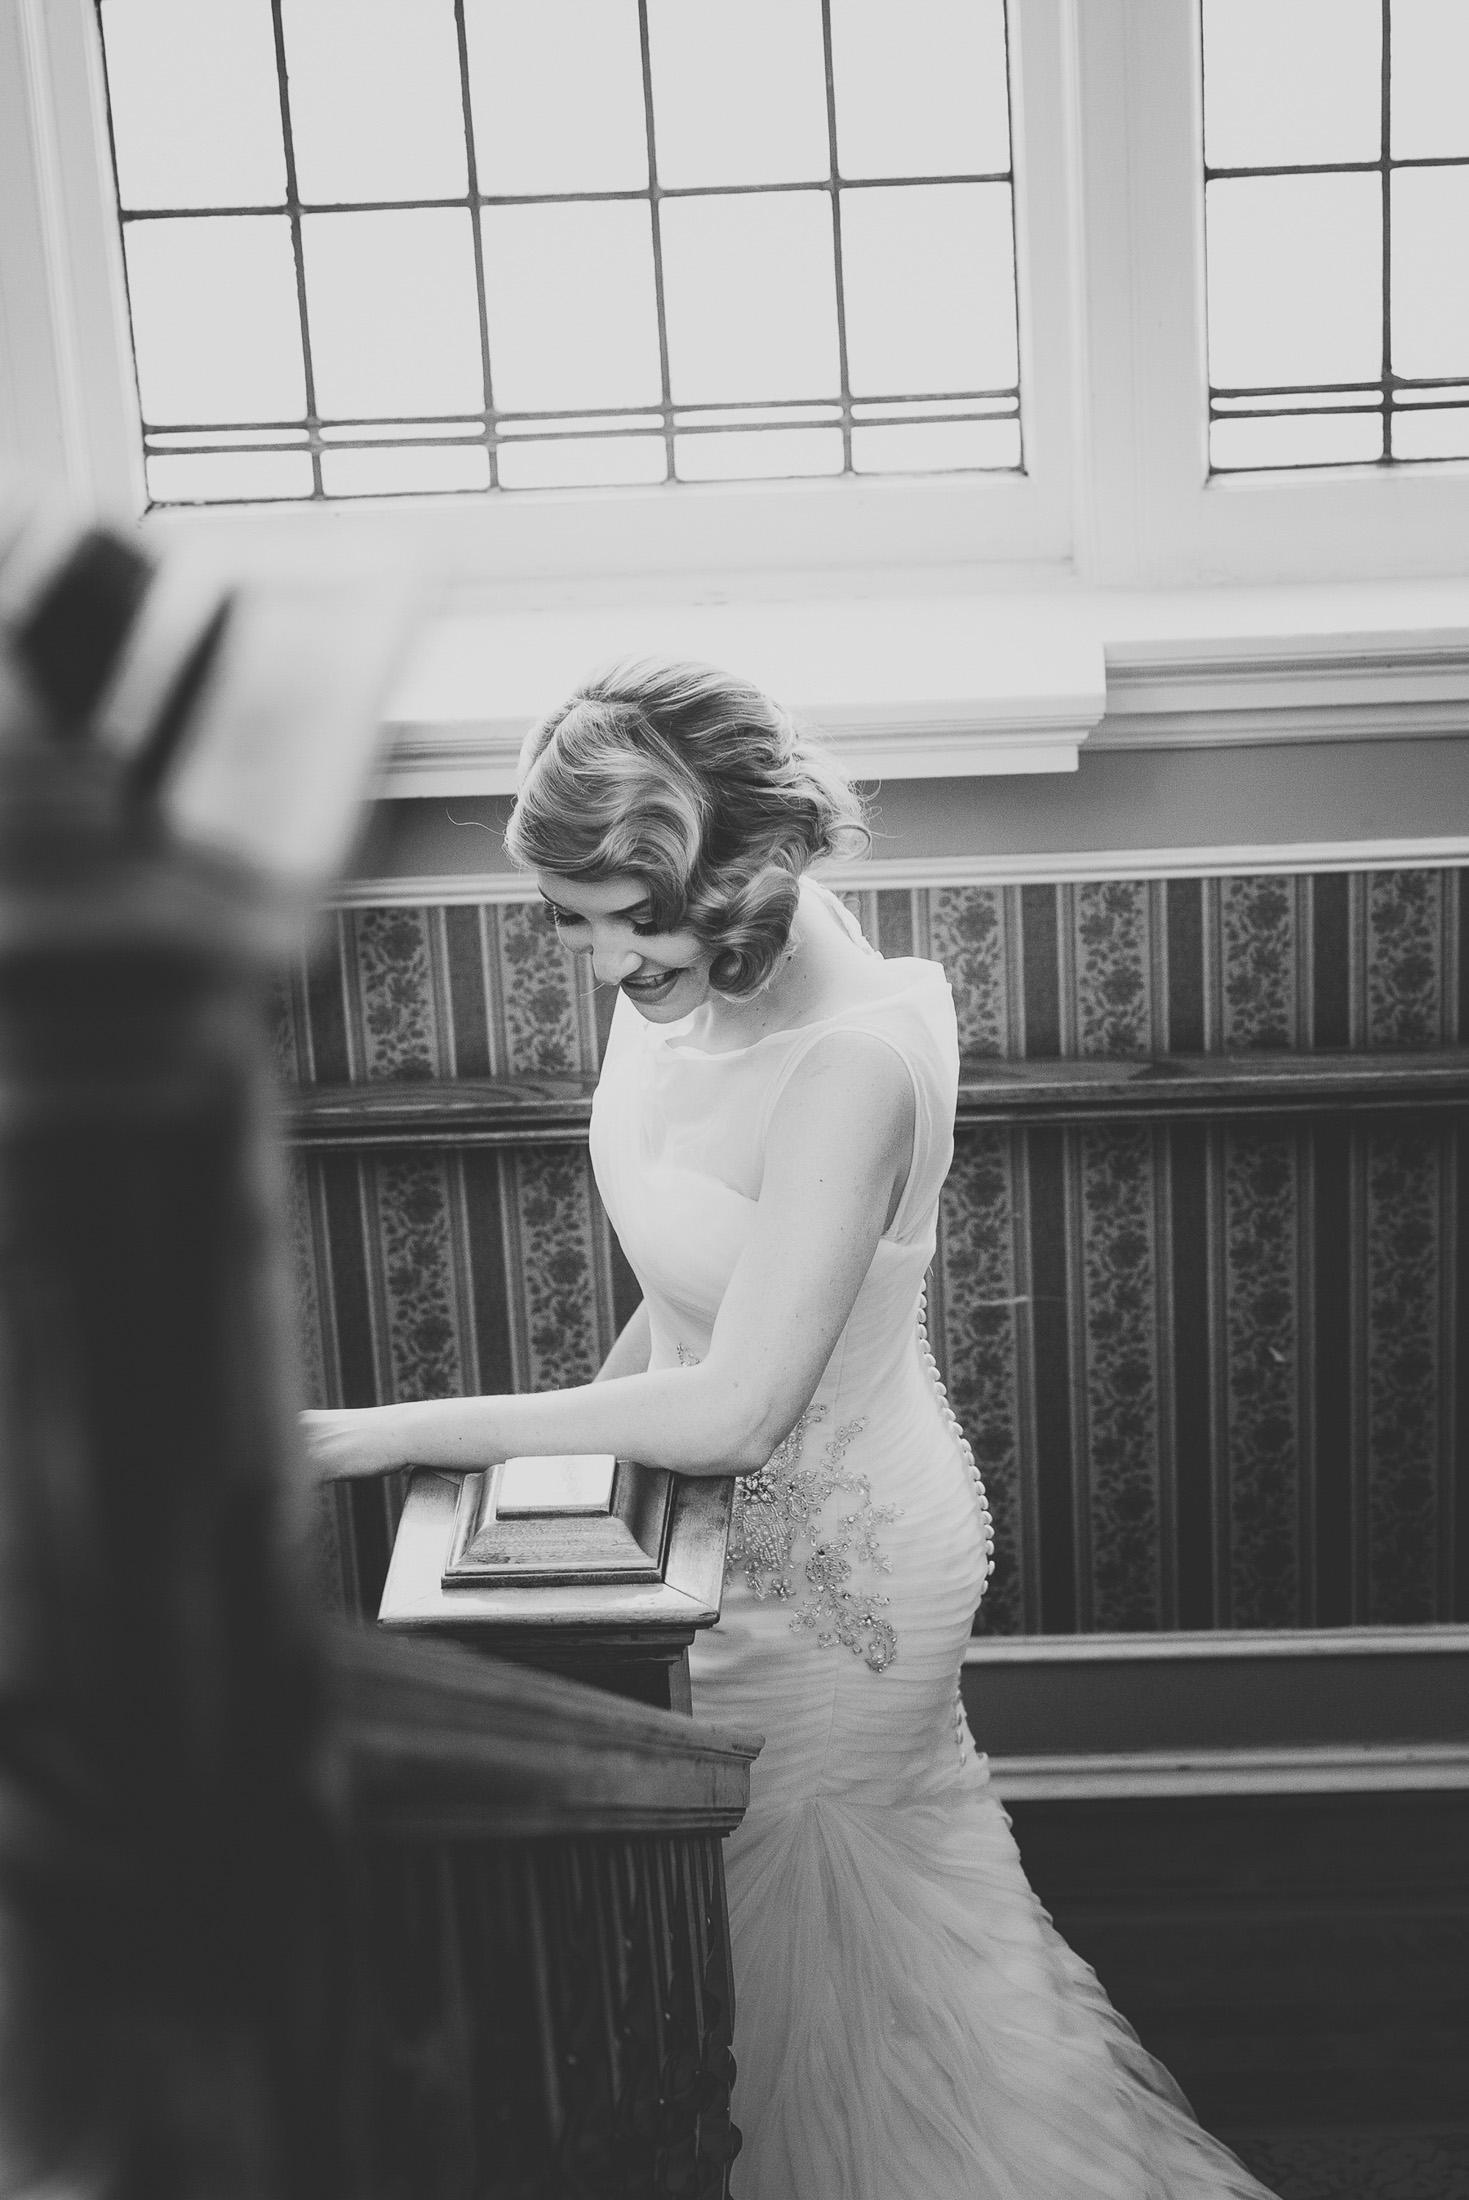 92elopement-photographer-colorado-denver_wedding_photographer_parkside_mansion_wedding_jessie&matt_0542_bw.jpg